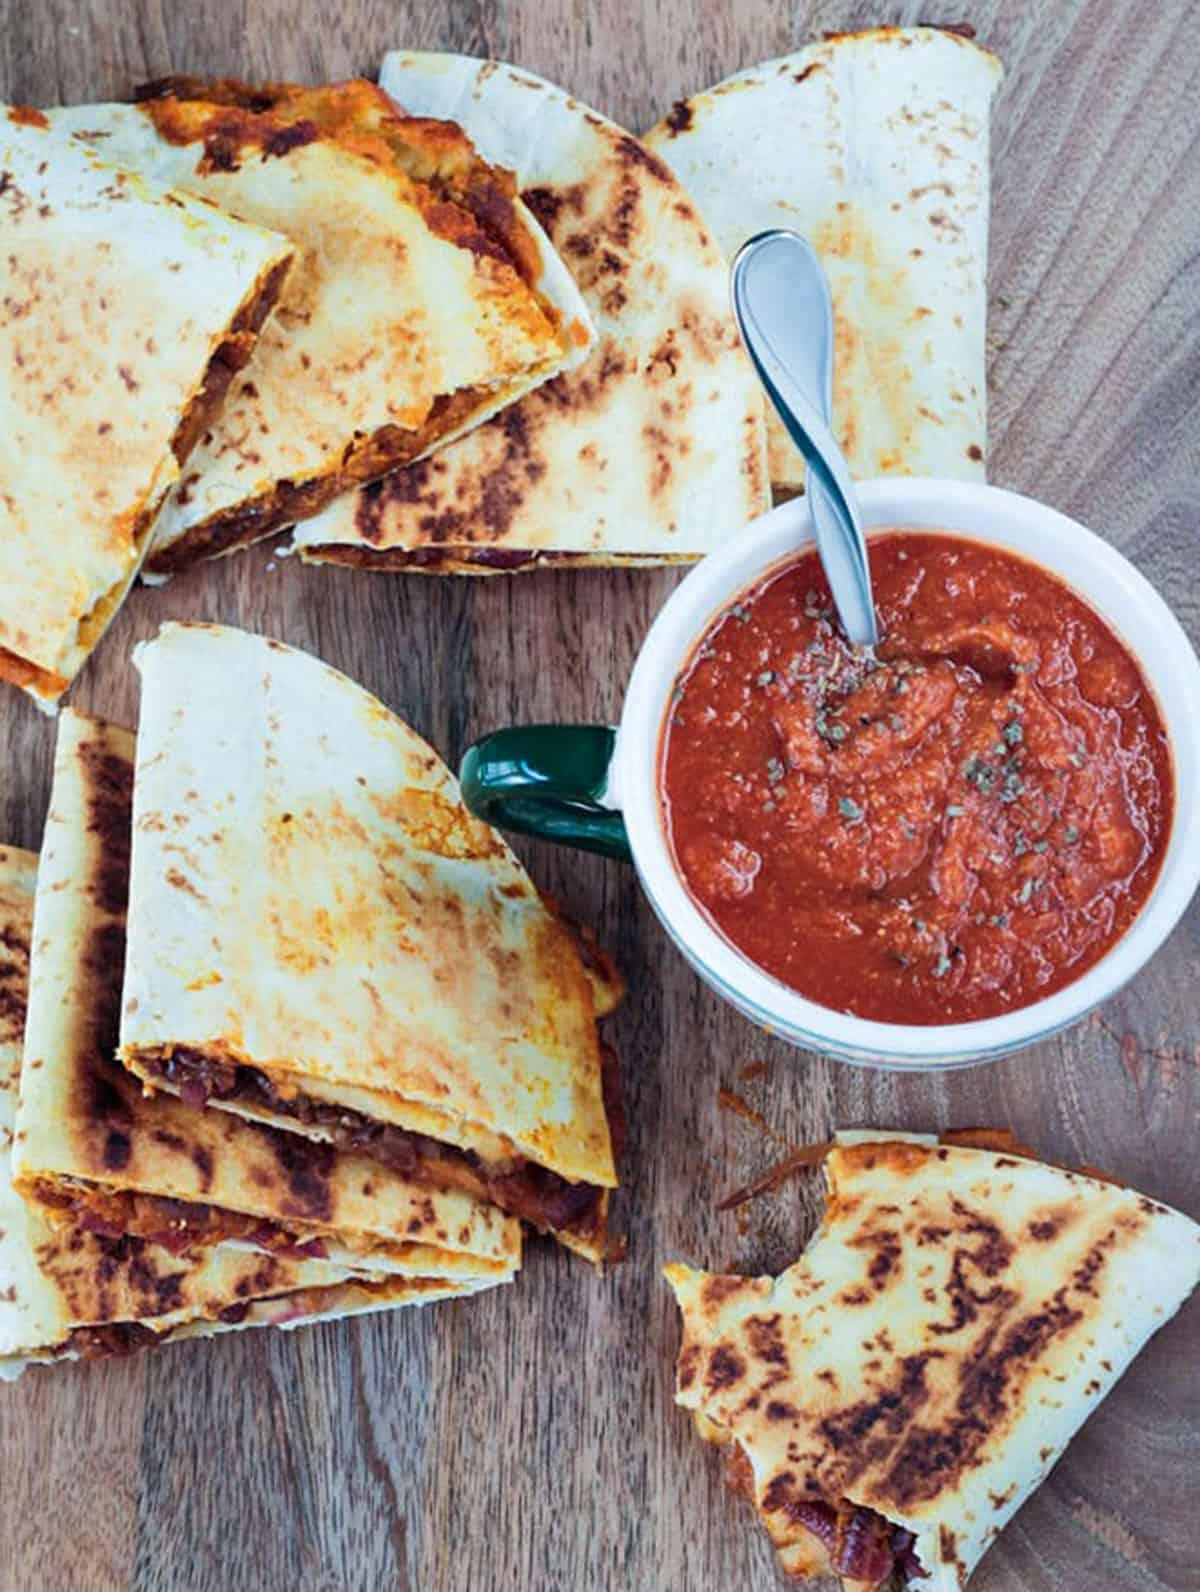 Several quesadilla halves surrounding a bowl of tomato soup.